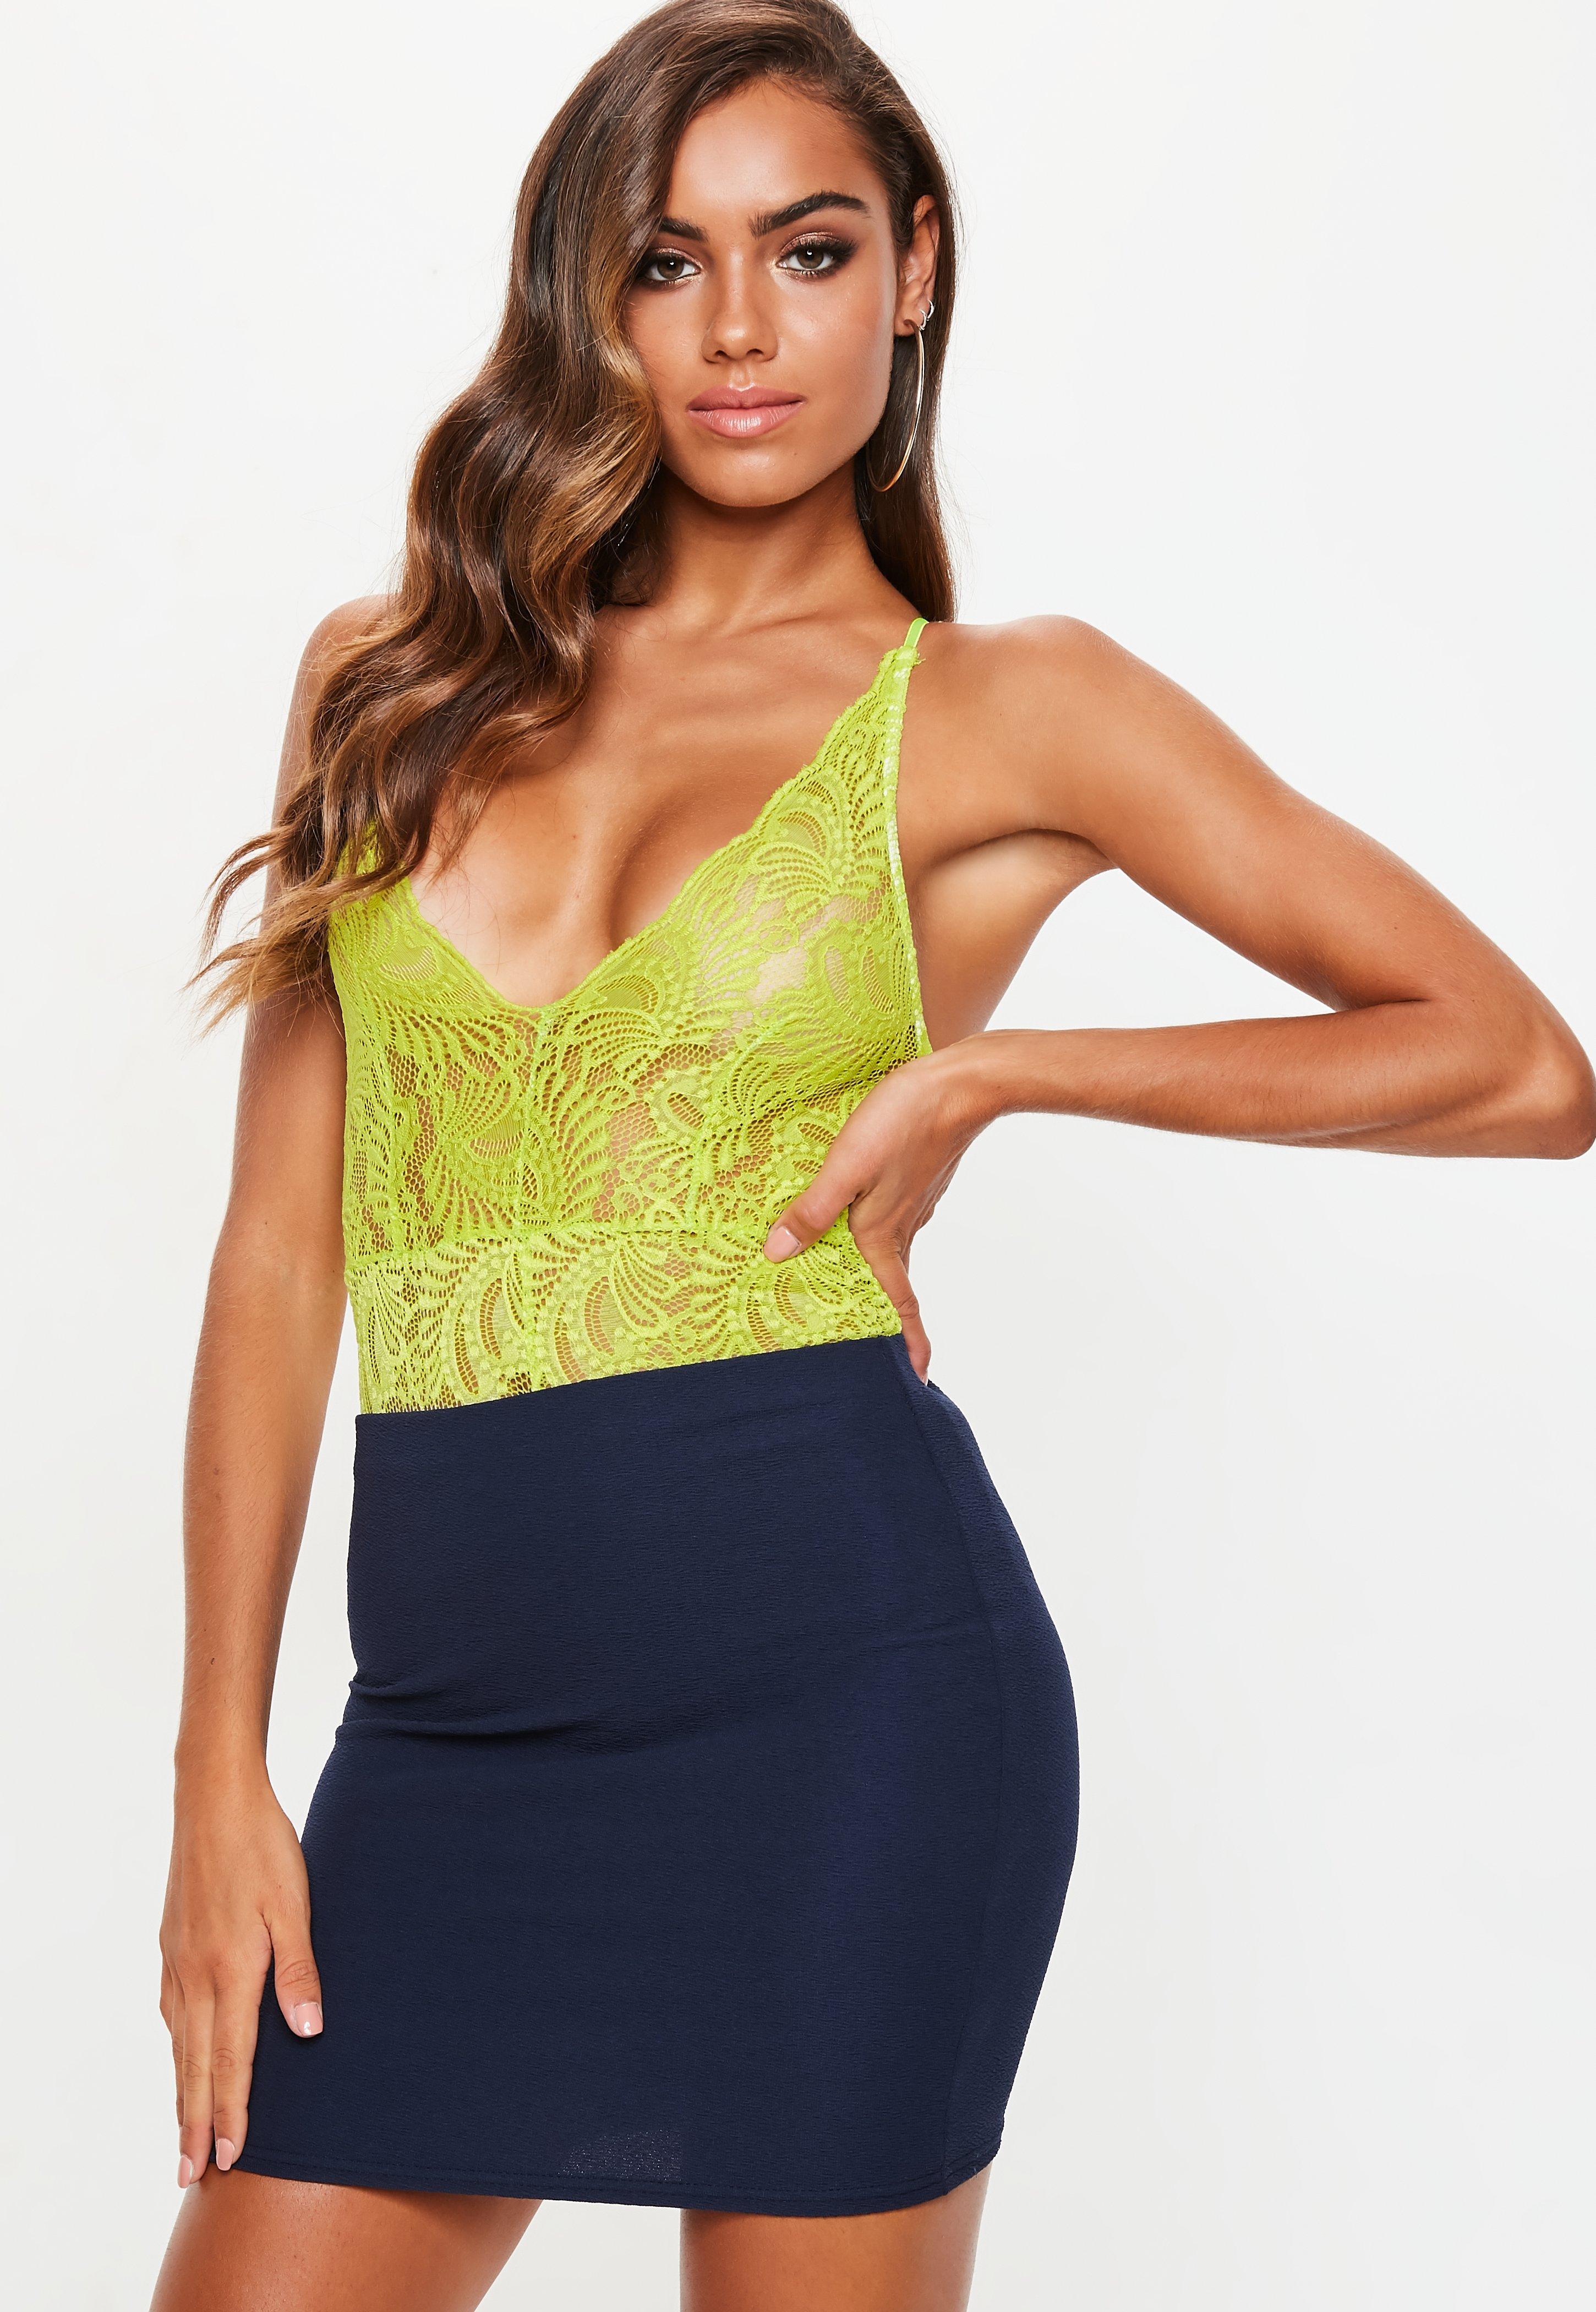 ef7b6da1697 Missguided Neon Green Lace Cami Bodysuit in Green - Lyst